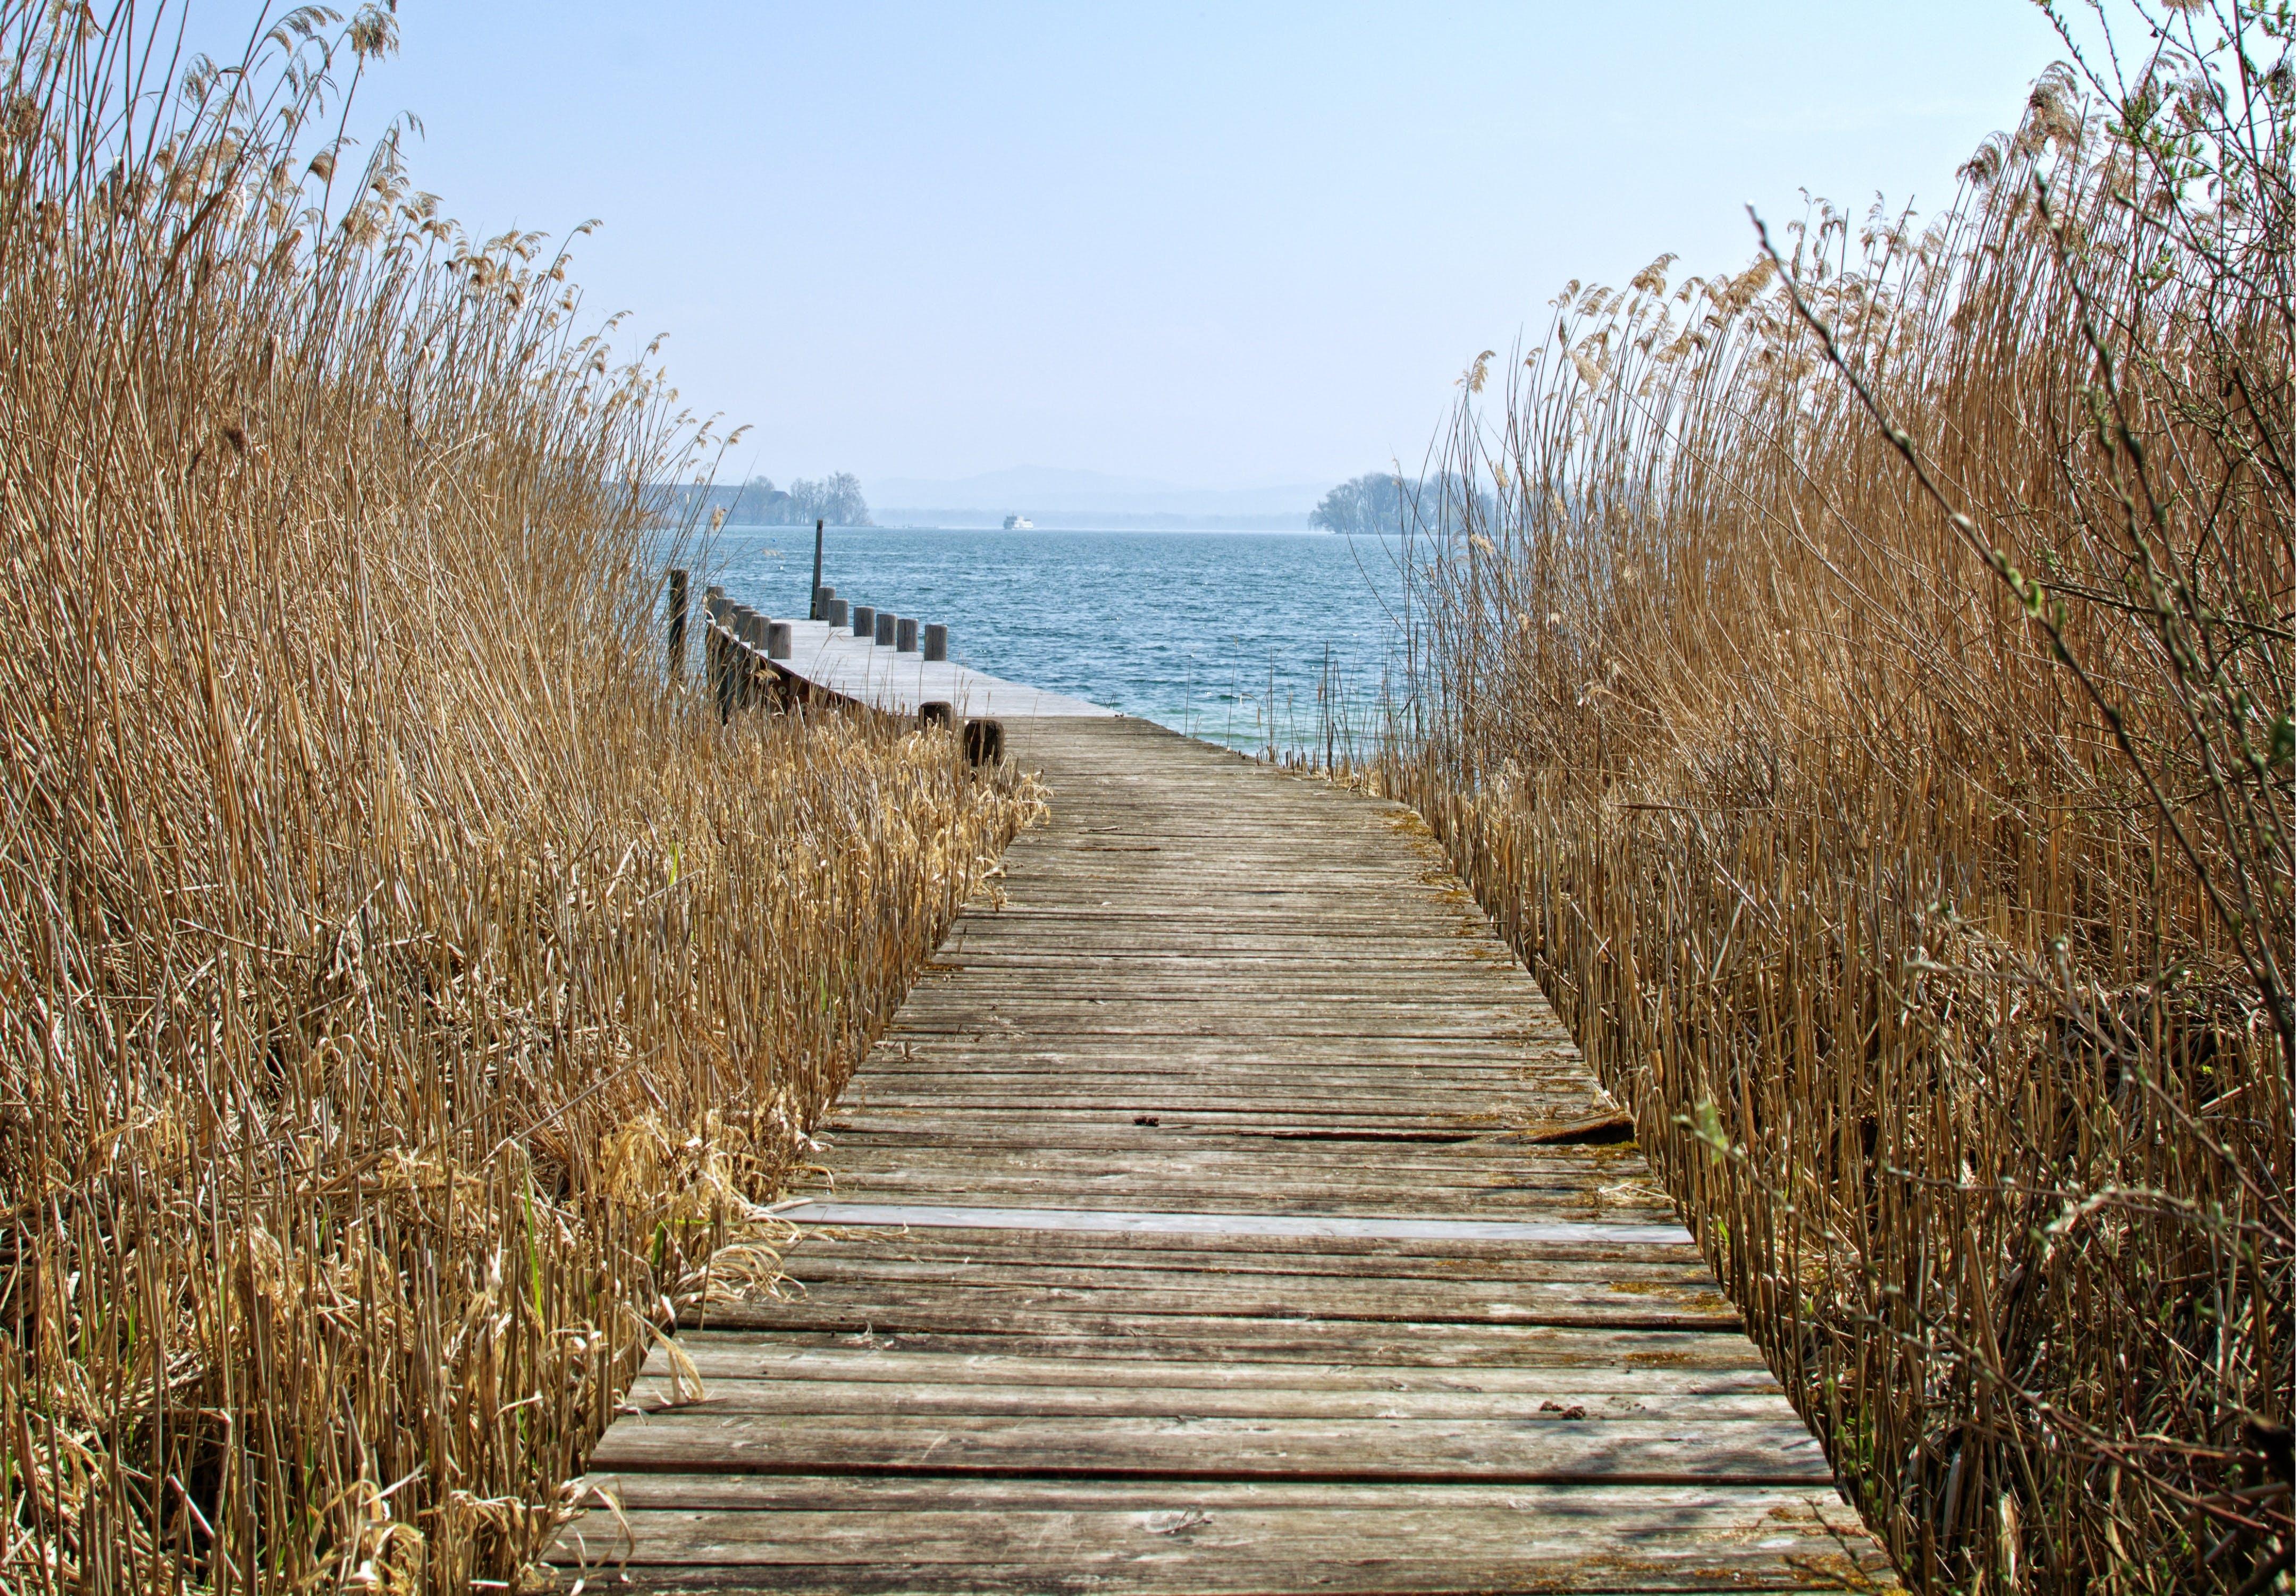 bank, beach, boardwalk